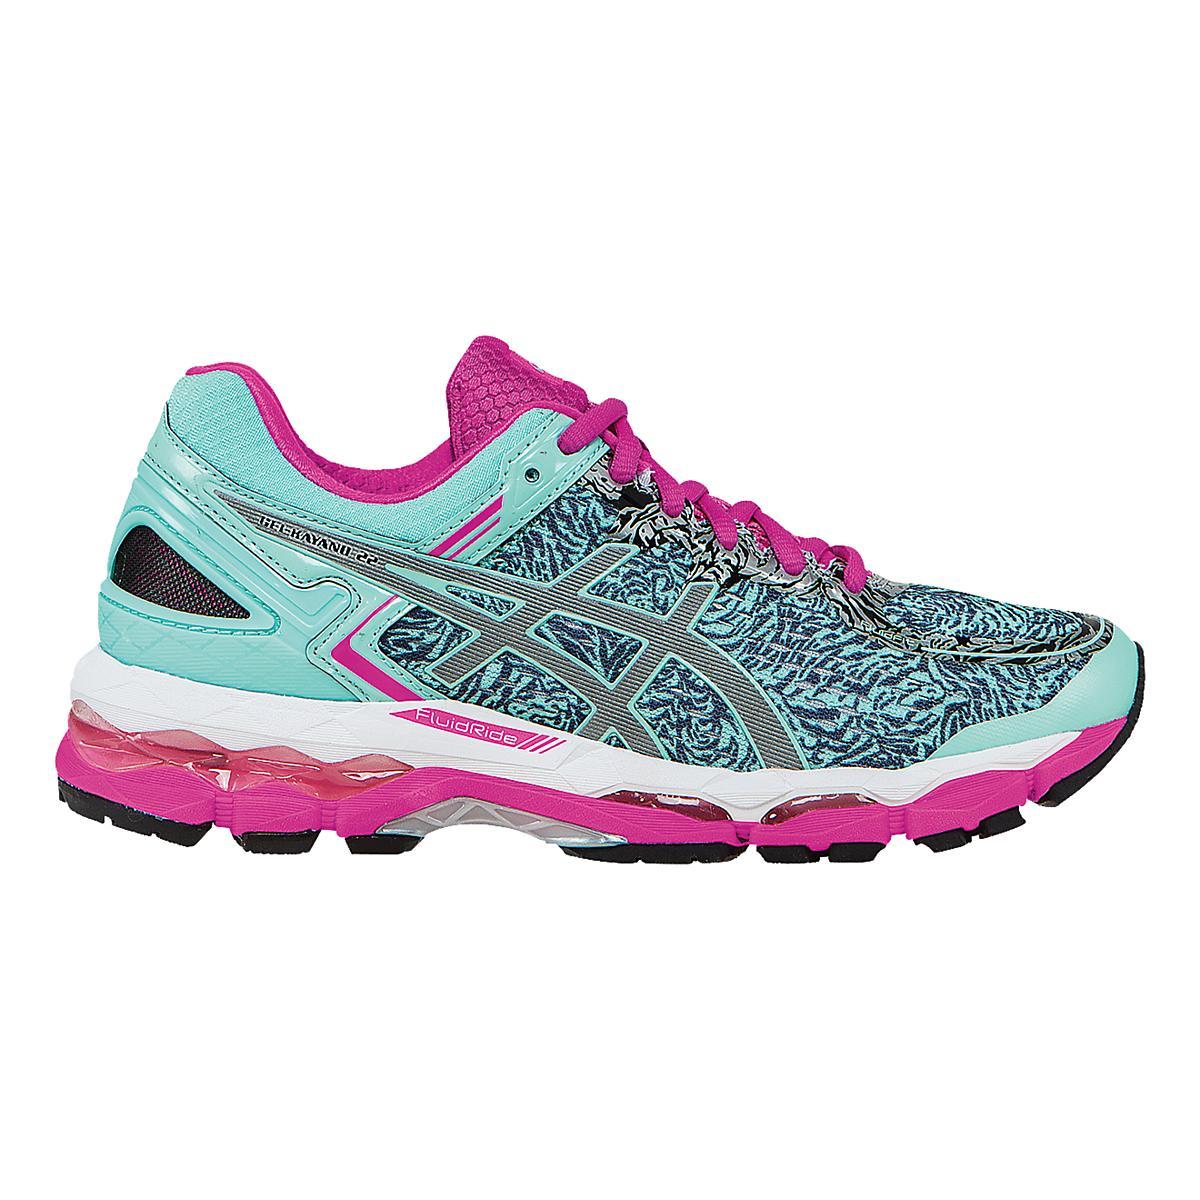 Womens ASICS GEL-Kayano 22 Lite-Show Running Shoe at Road Runner Sports cf6bb8c6c2